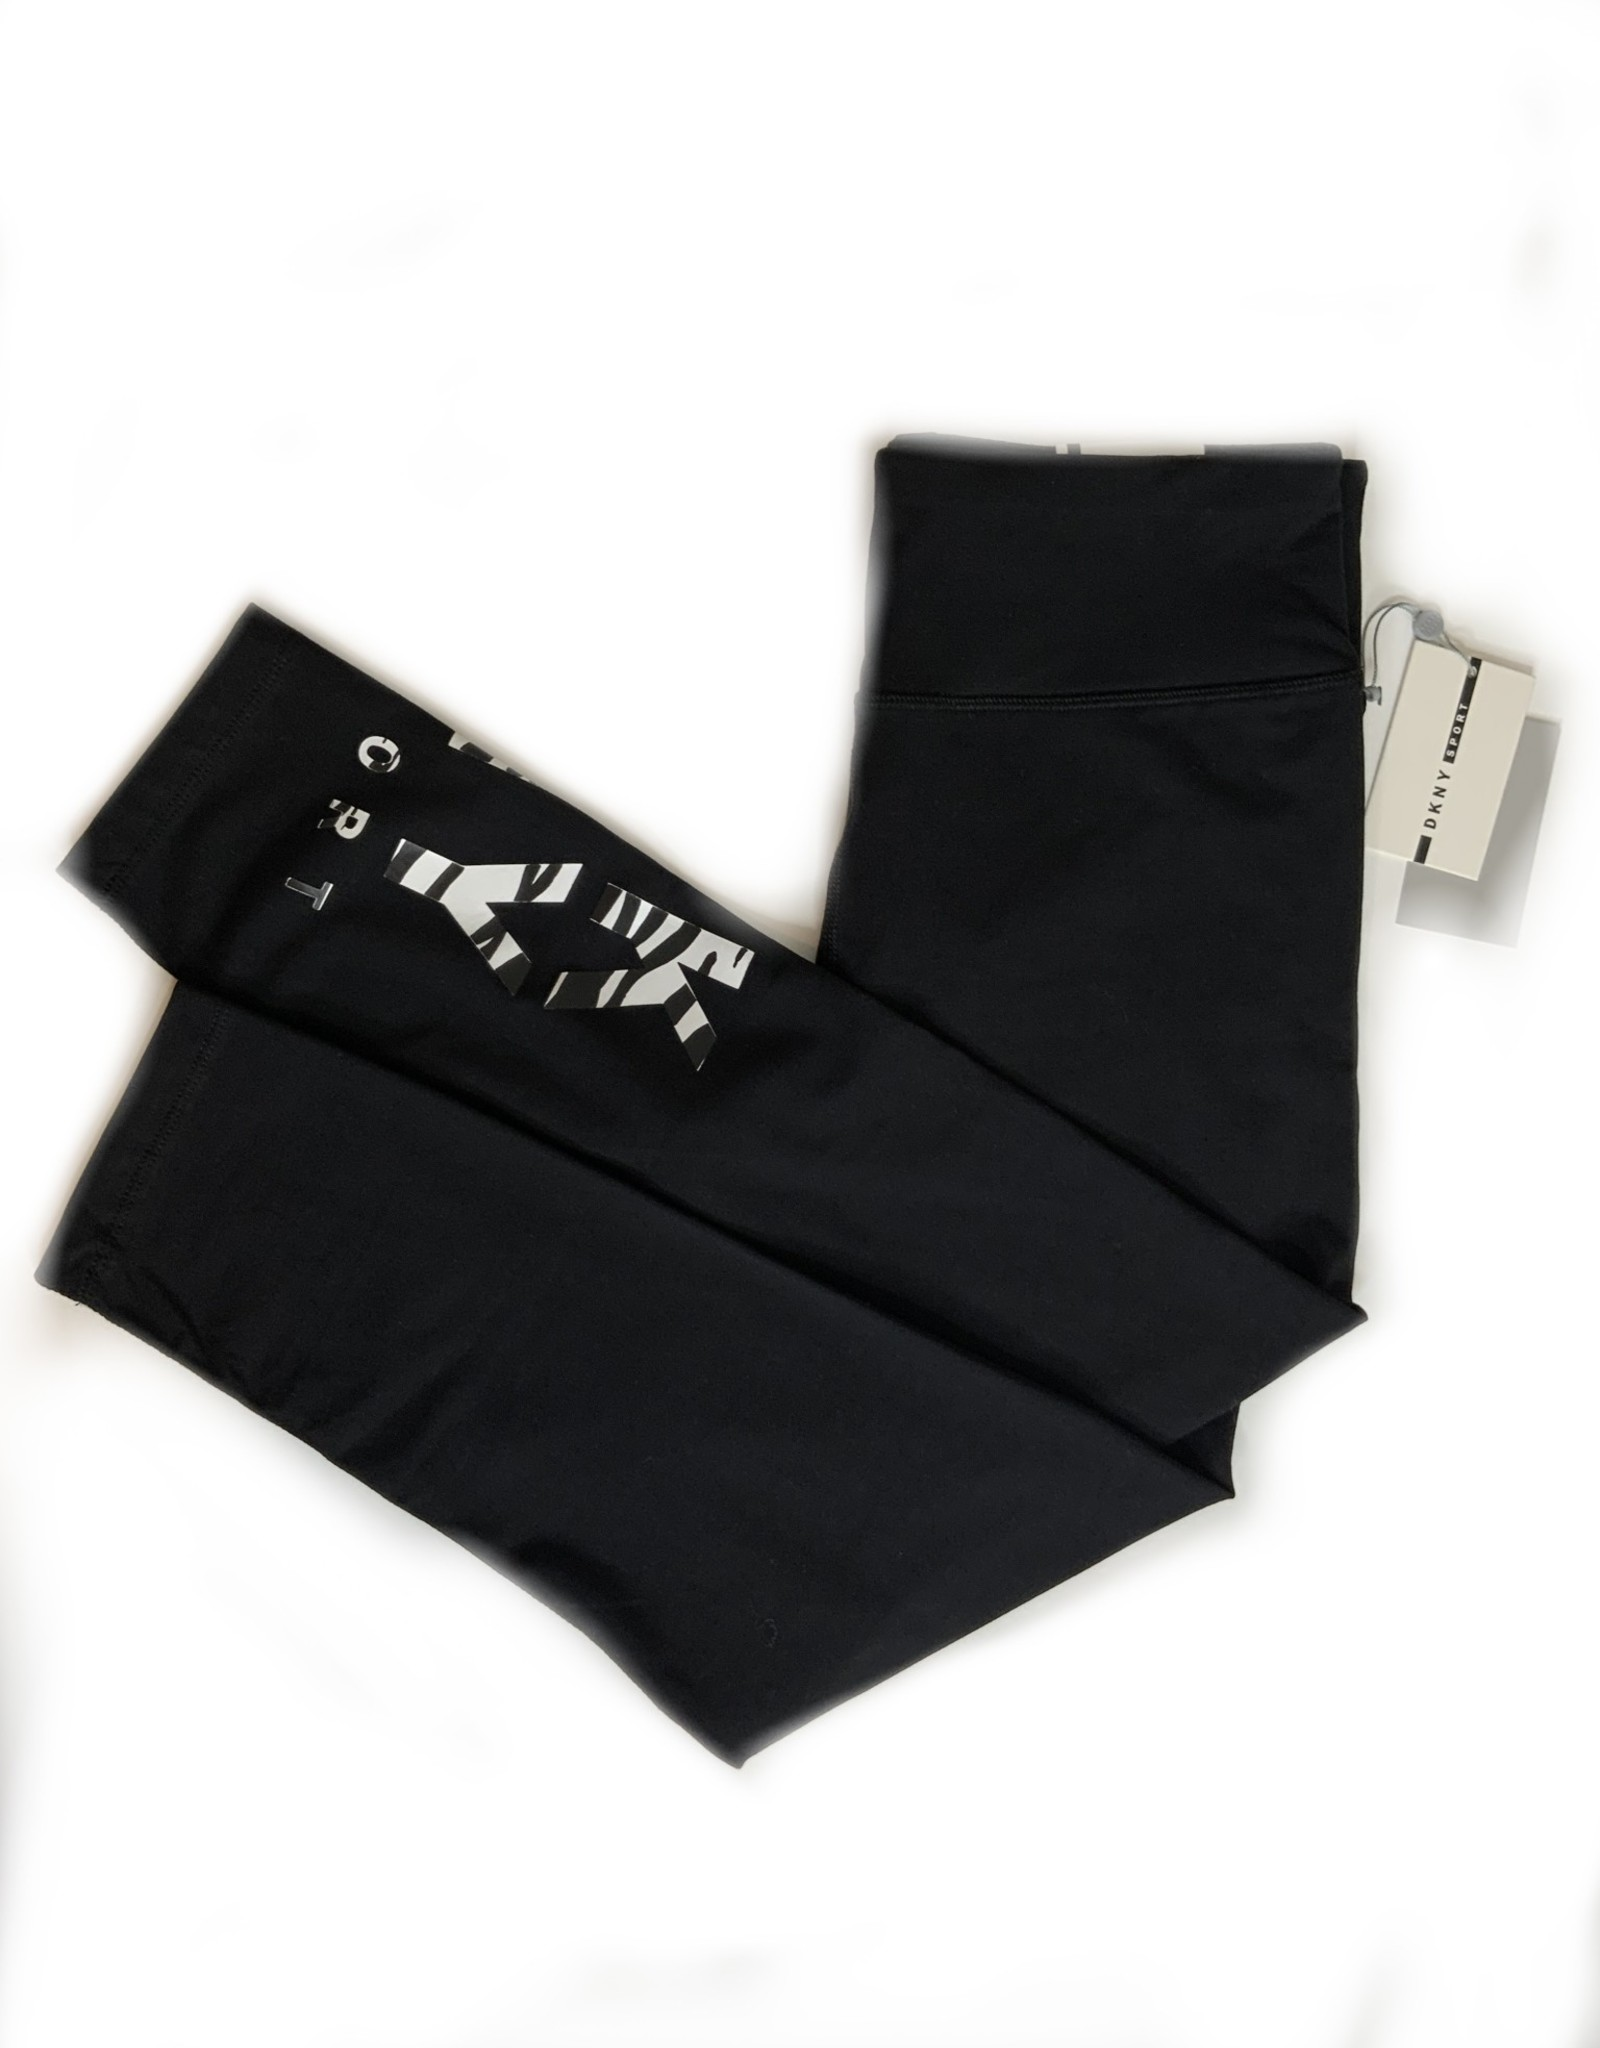 DKNY DKNY Leggings High Waist 7/8 Zebra Logo